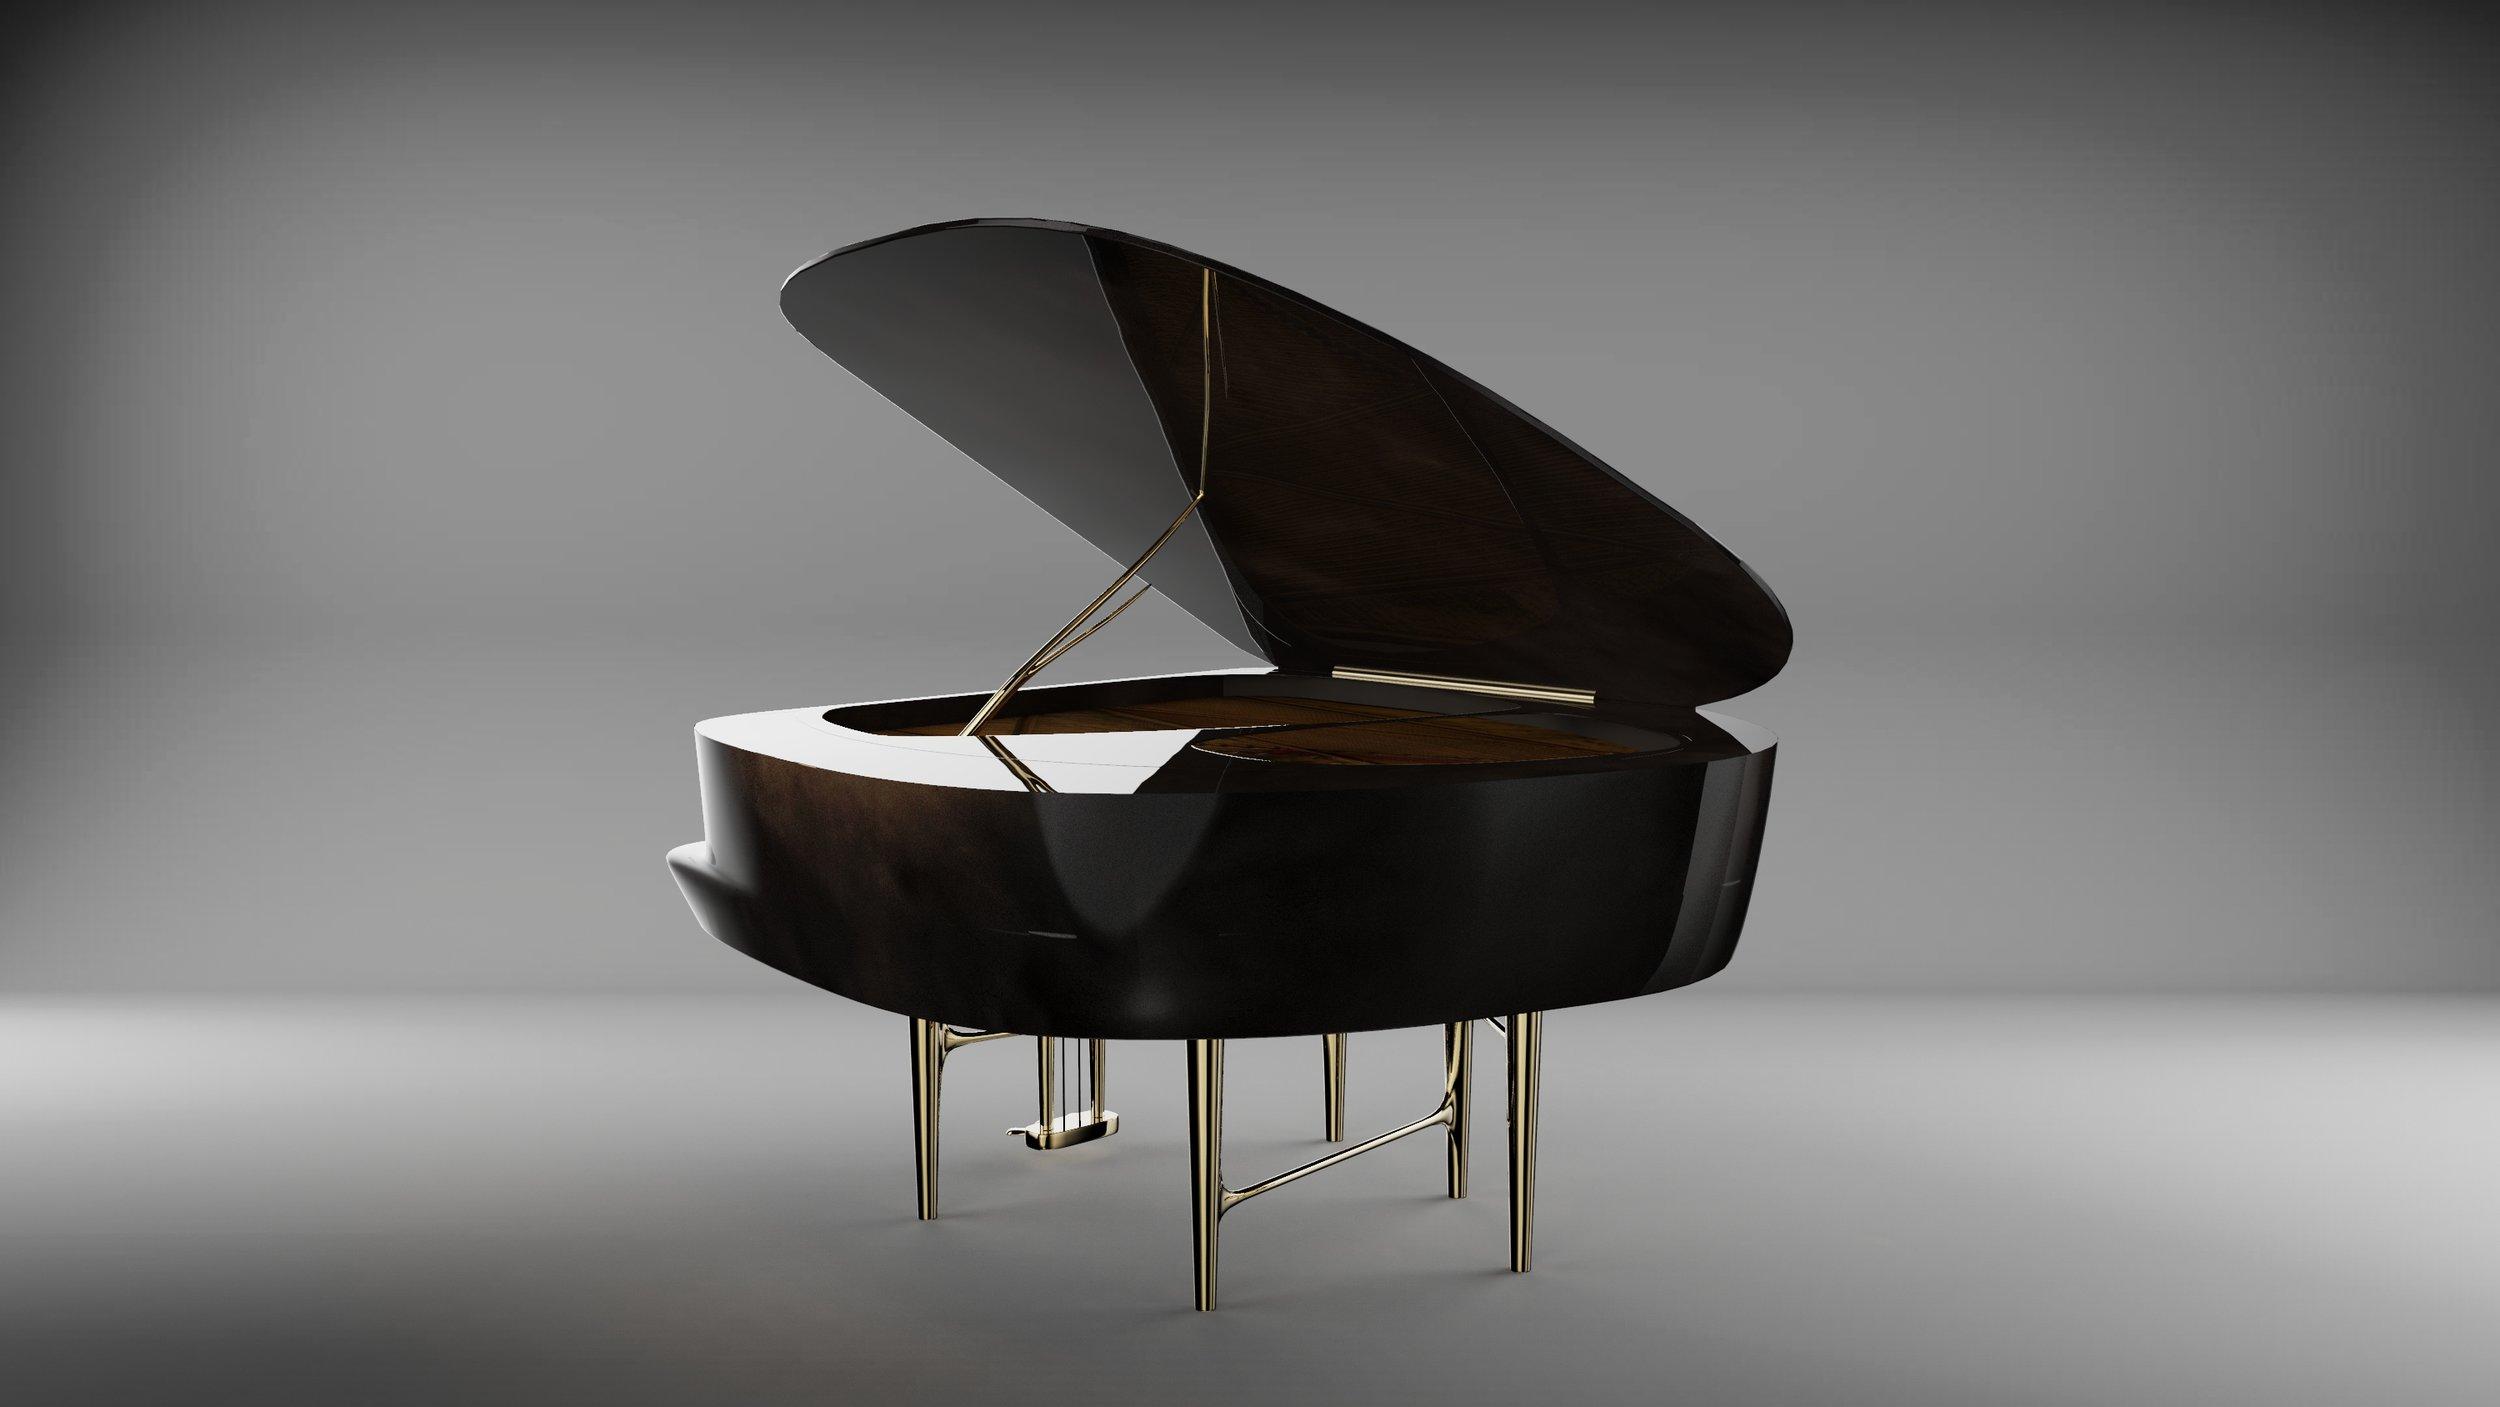 190522_BU_Una_piano_render.2028.jpg